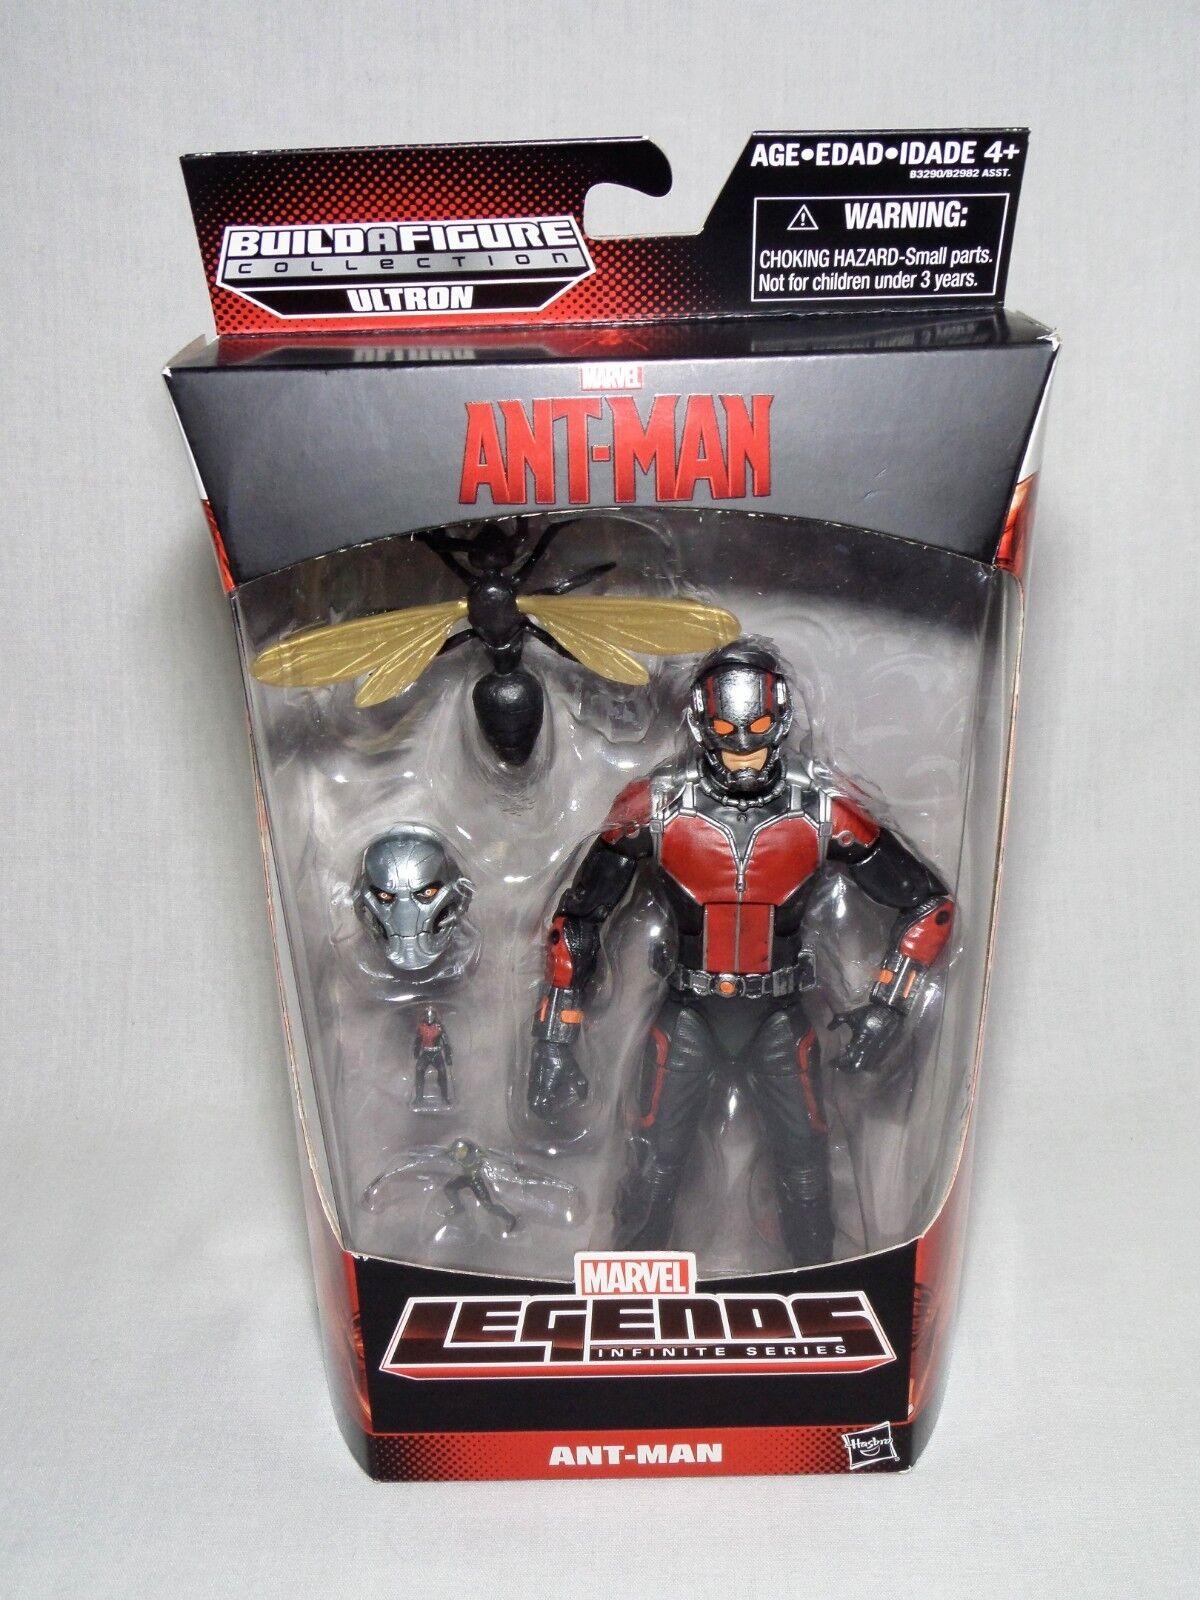 MARVEL LEGENDS Infinite Series ANT MAN -Ultron Build a Figure-